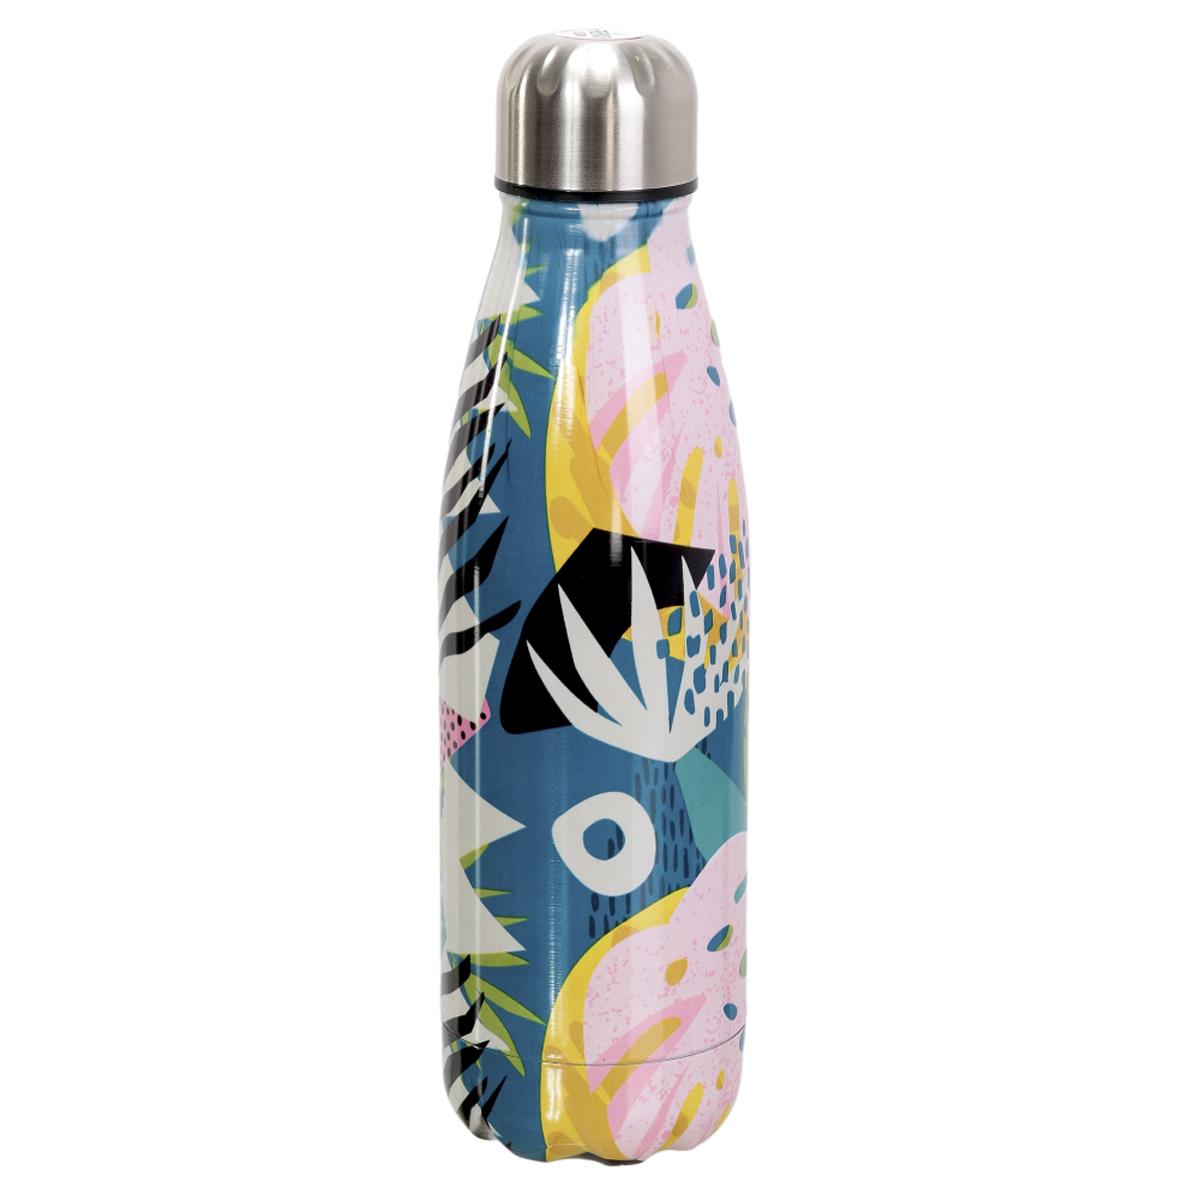 Bouteille isotherme design \'Floral\' multicolore - 25x6 cm (500 ml) - [A1725]